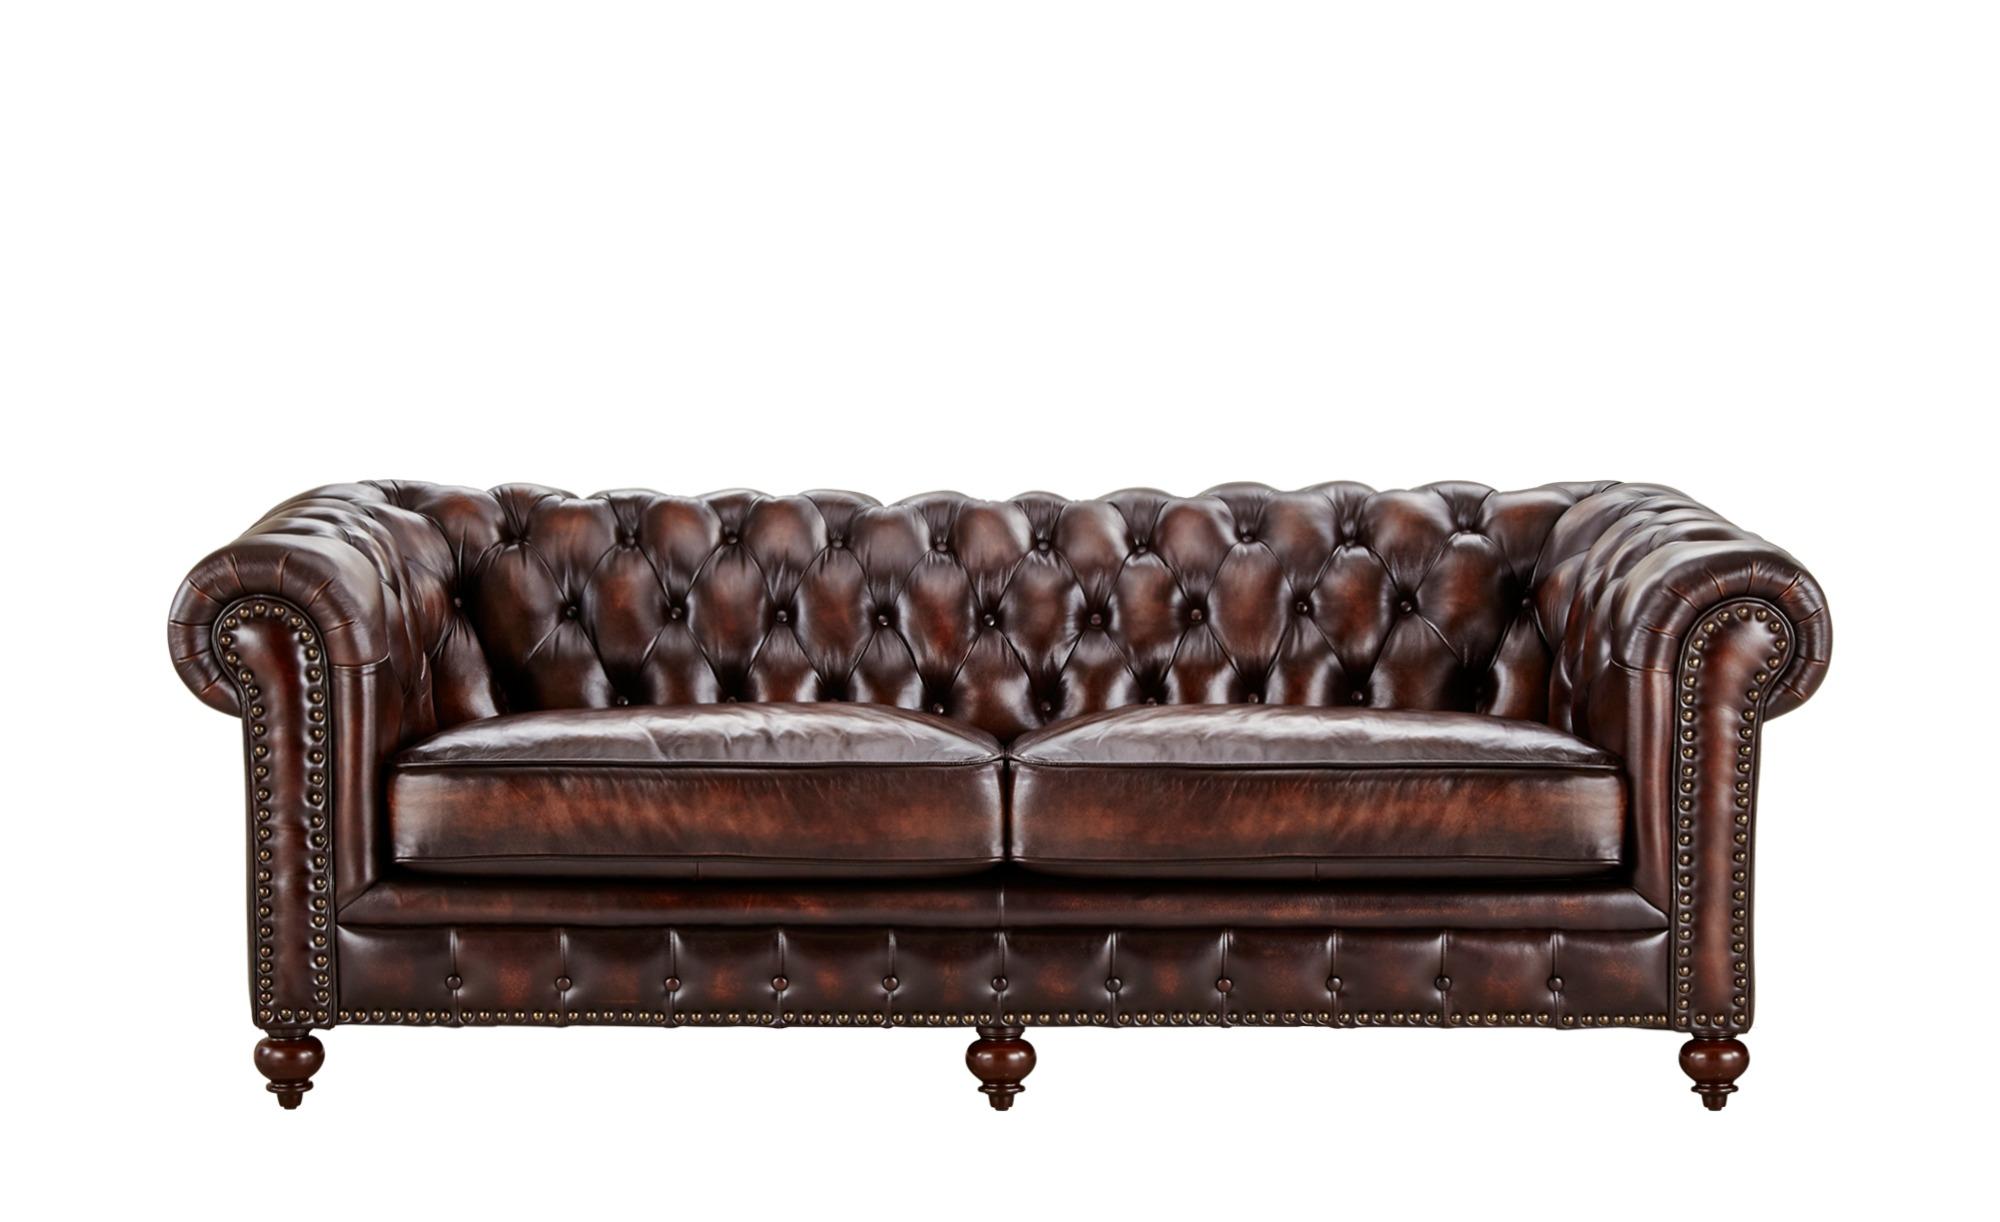 uno Sofa 3-sitzig Leder braun - Leder Chesterfield ¦ braun ¦ Maße (cm): B: 230 H: 80 T: 100 Polstermöbel > Sofas > 3-Sitzer - Höffner